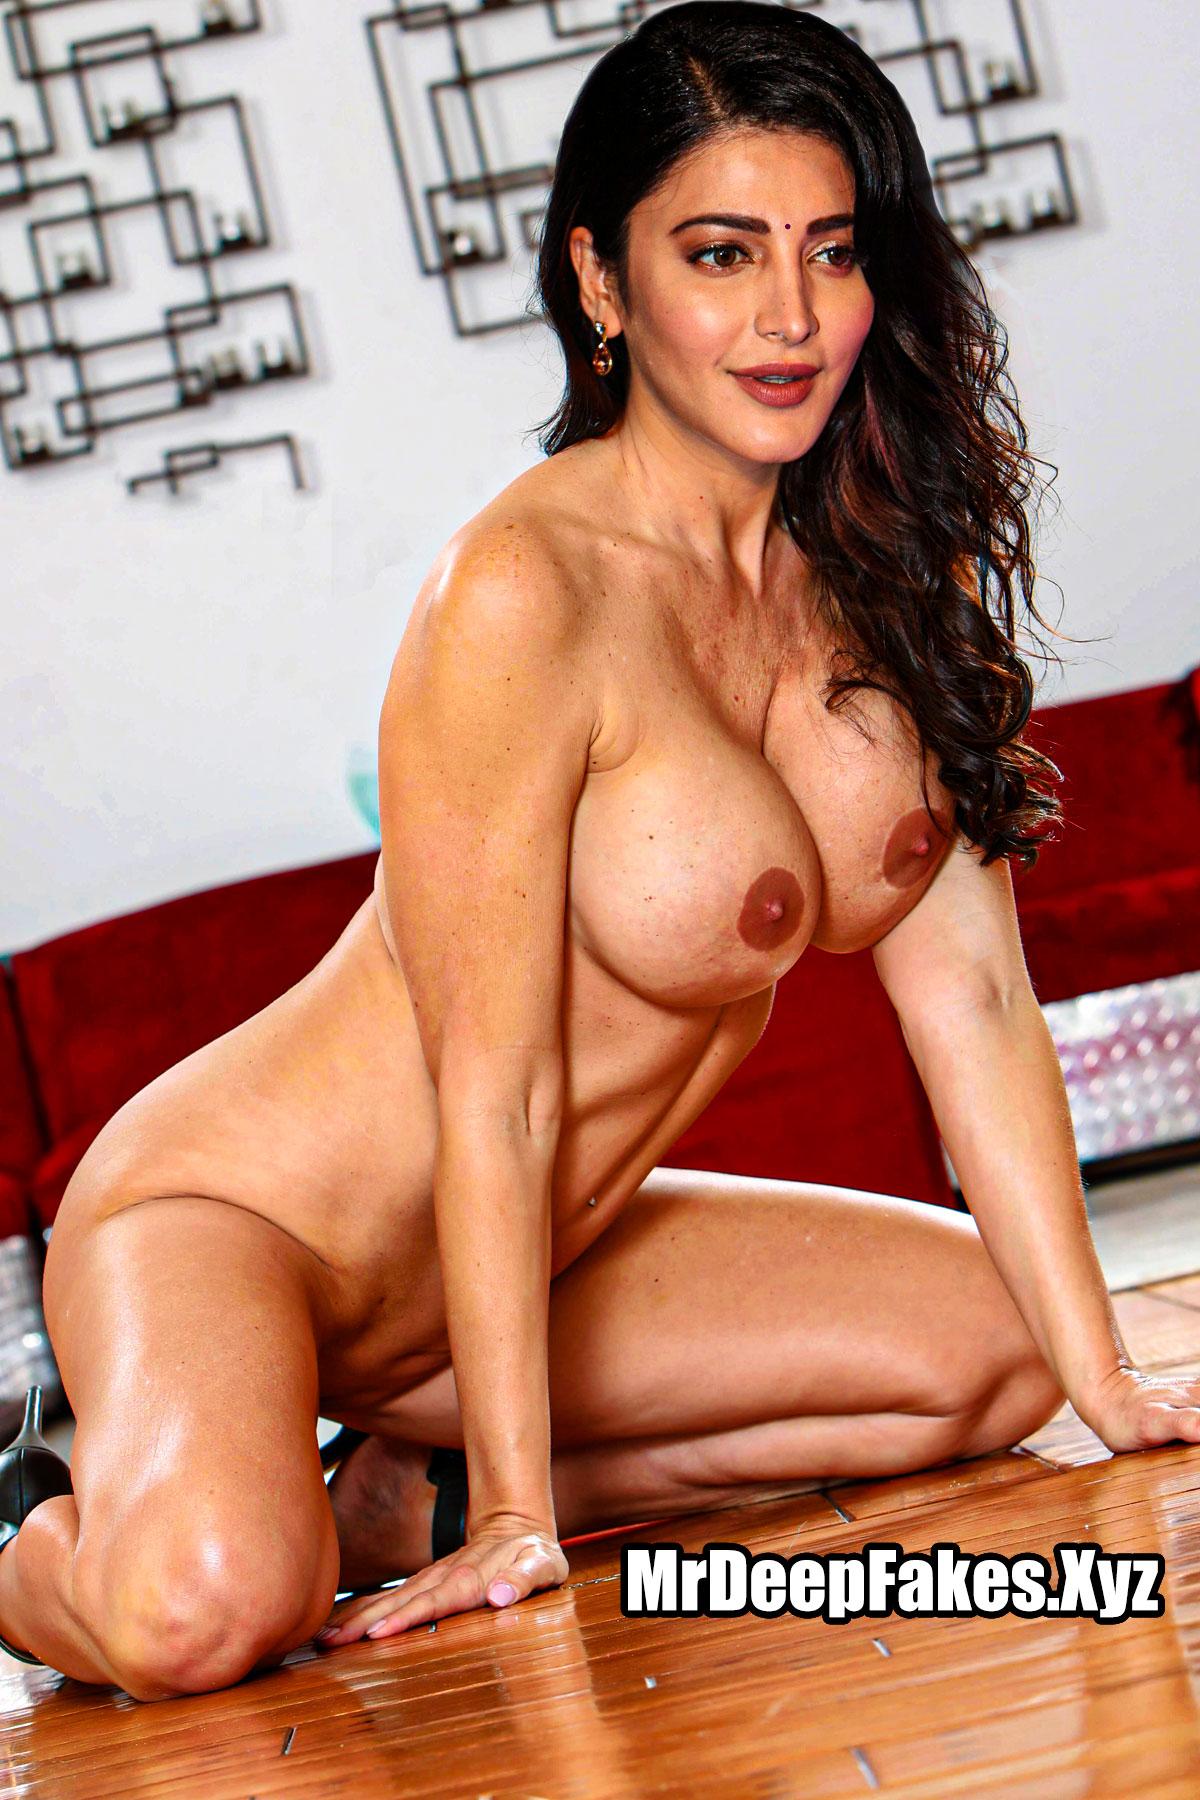 Shruti Haasan big fake boobs naked beautiful body hot pic